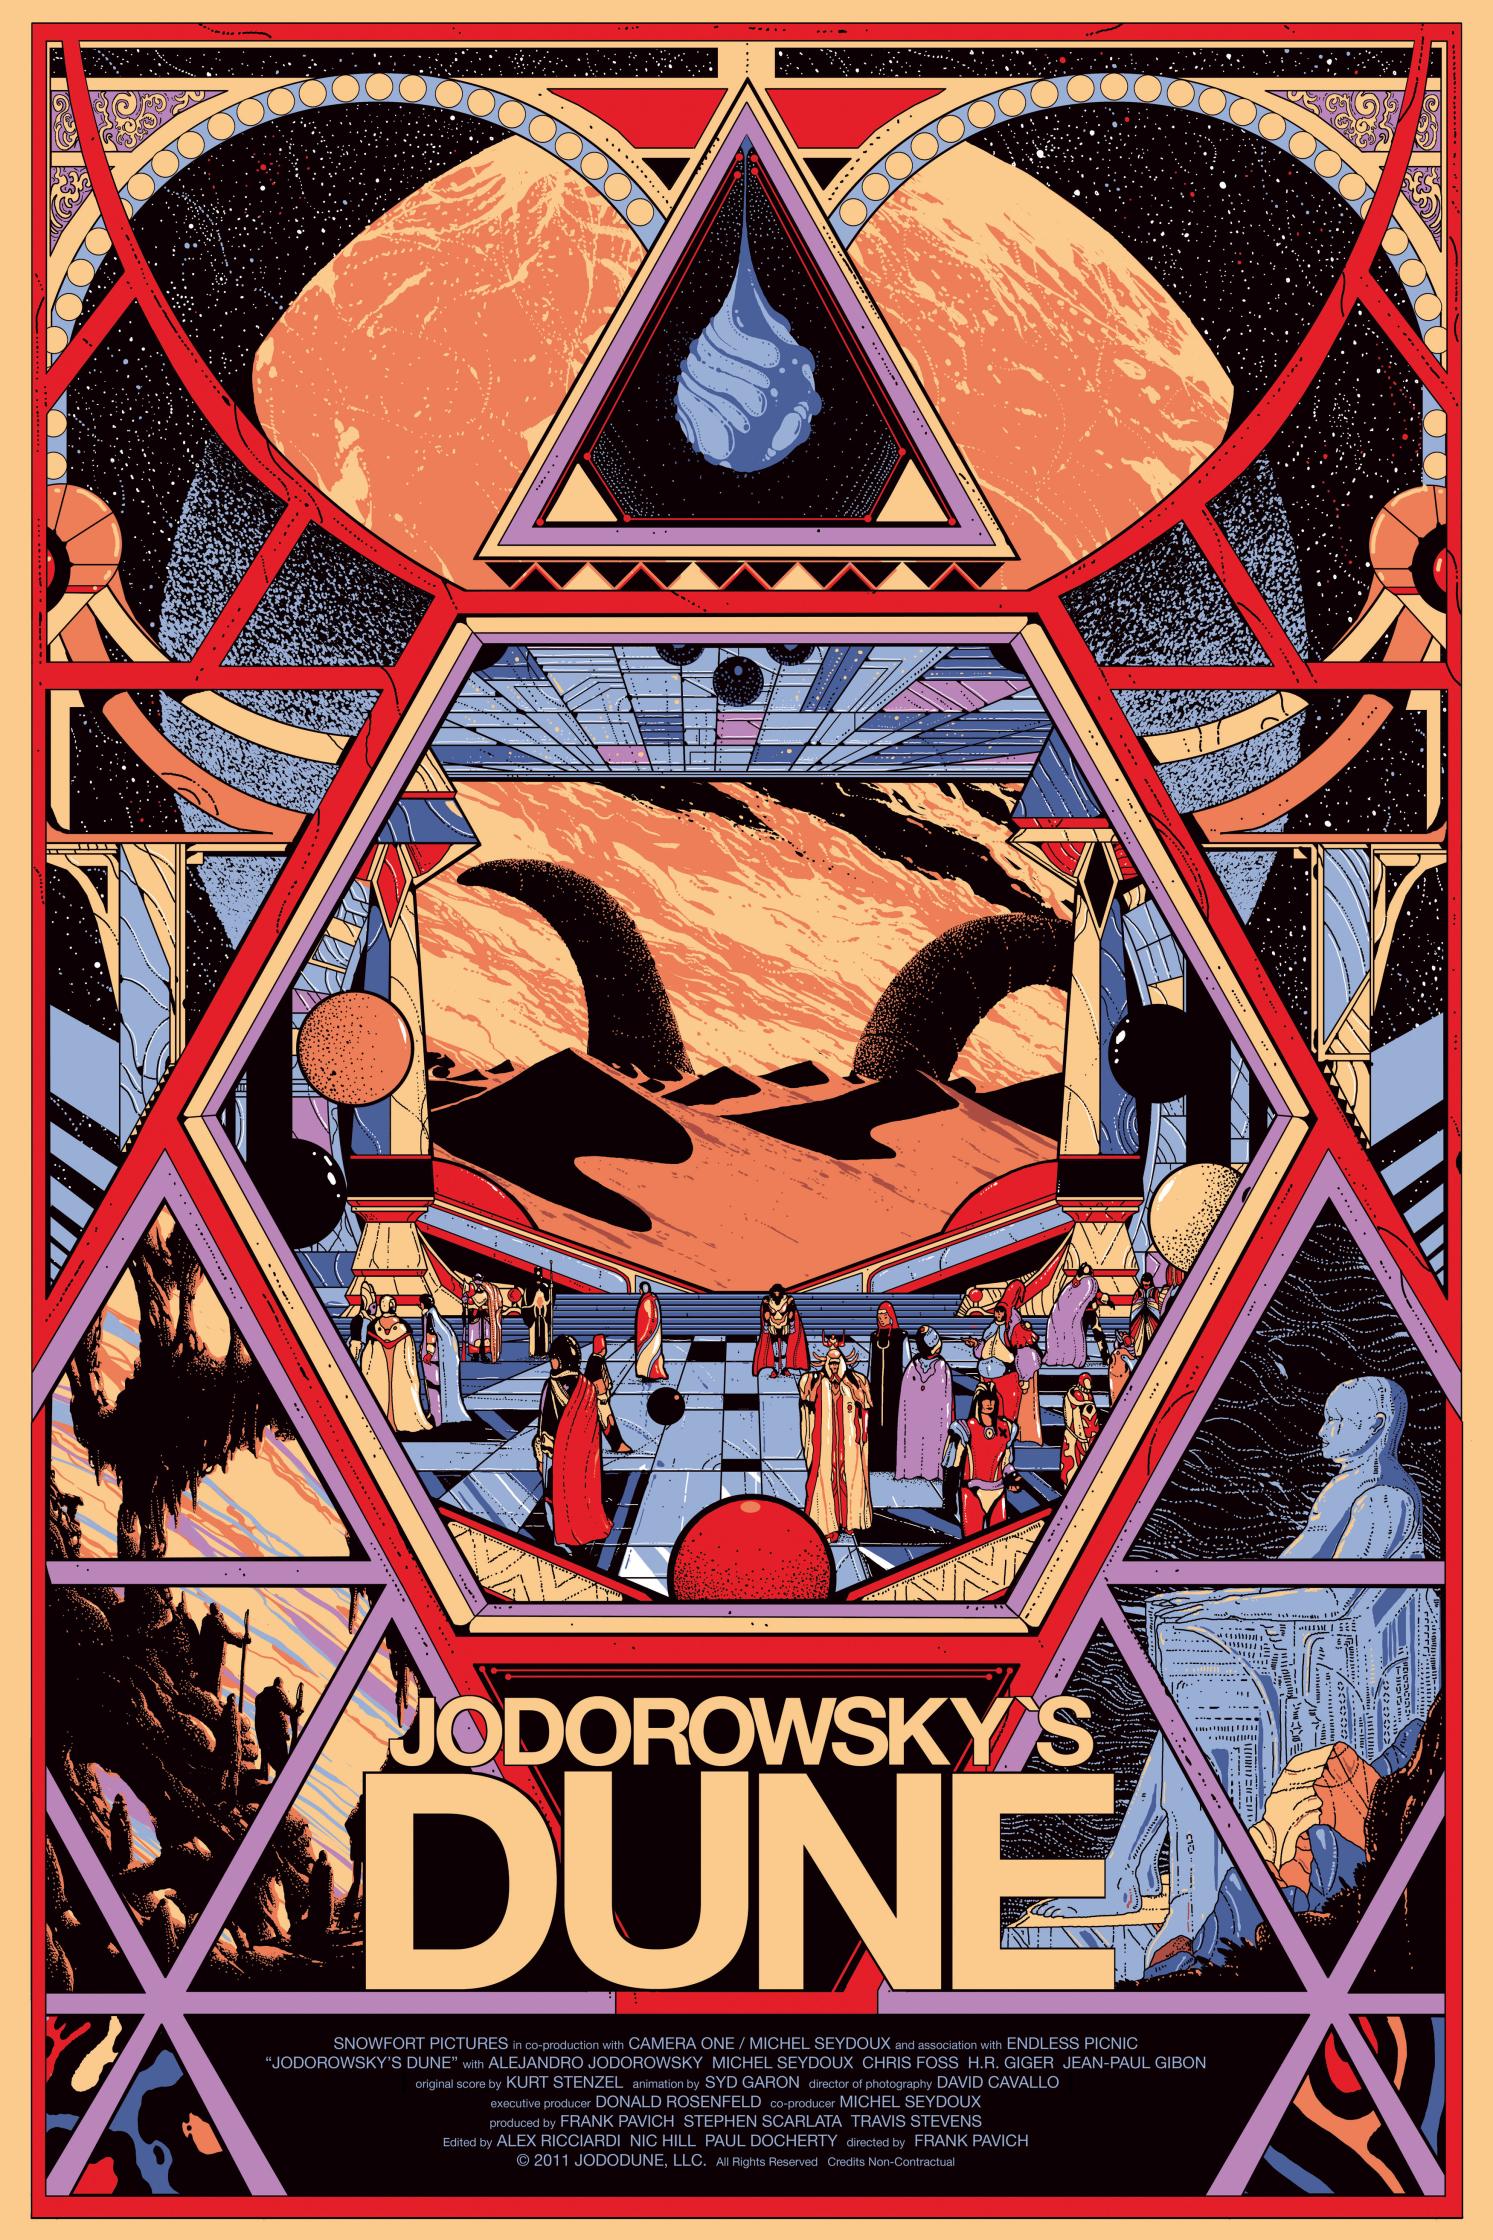 Mondo Jodorowsky's Dune Screenprint Poster